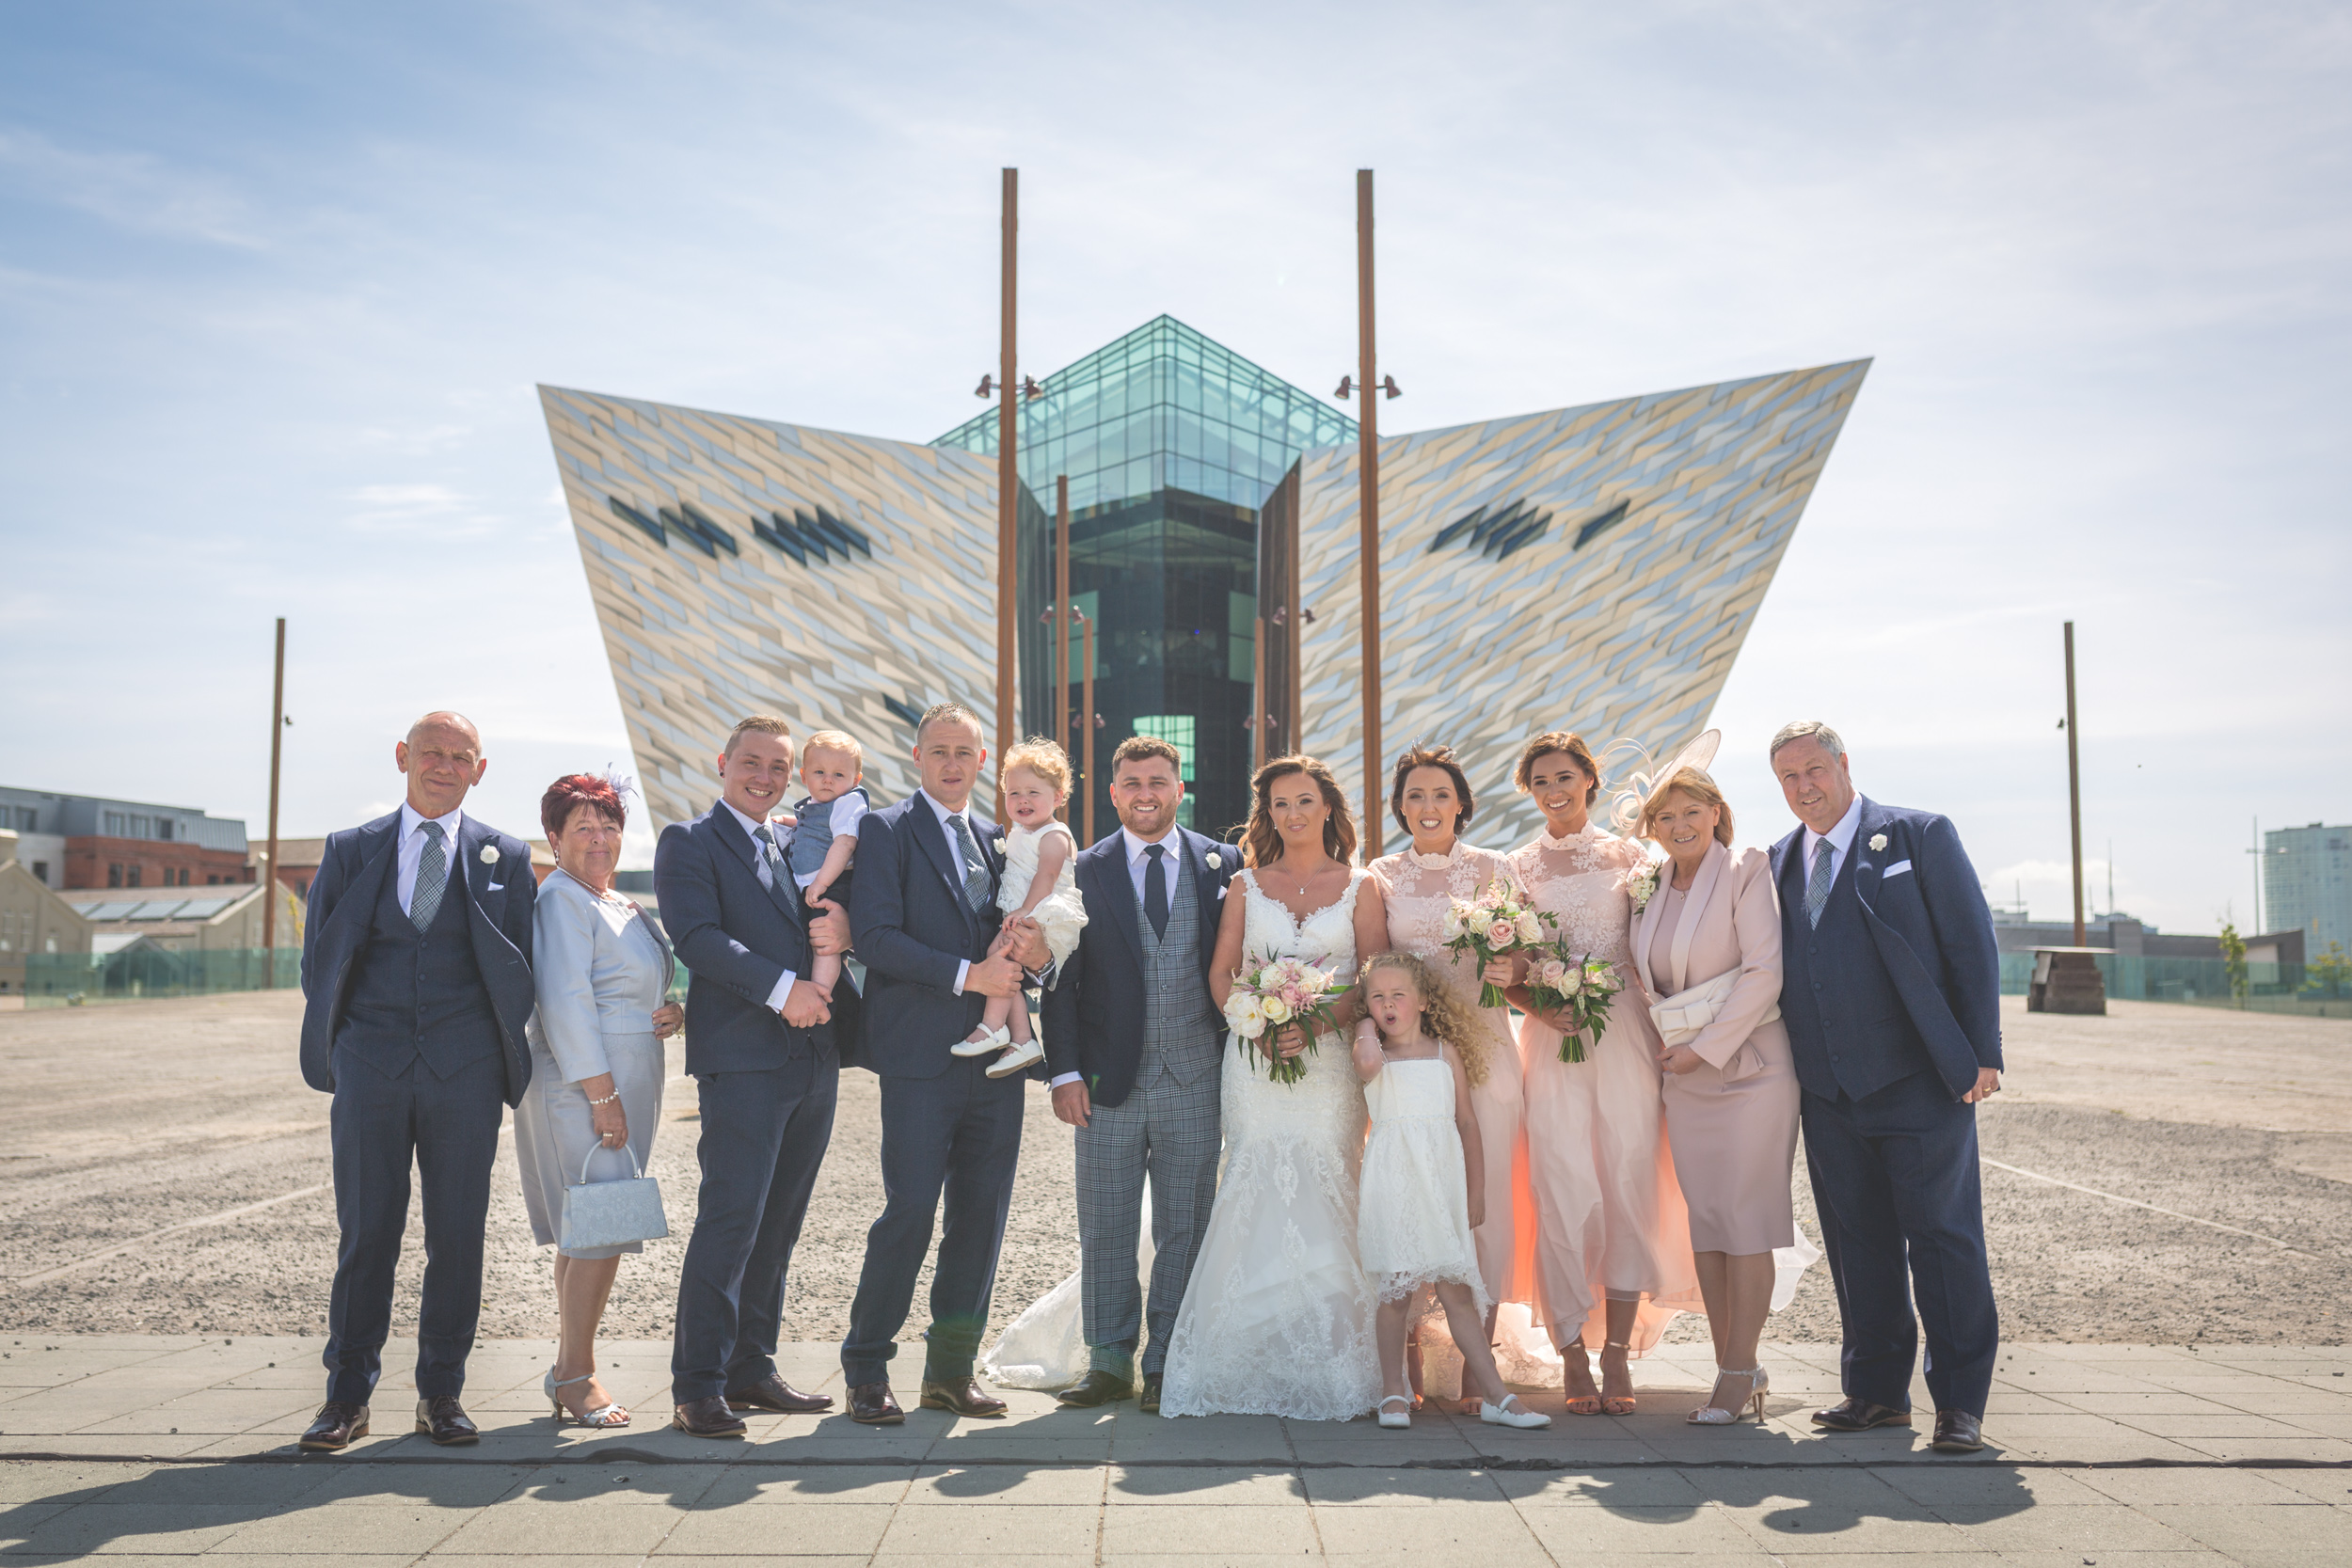 Brian McEwan   Northern Ireland Wedding Photographer   Rebecca & Michael   Portraits-22.jpg